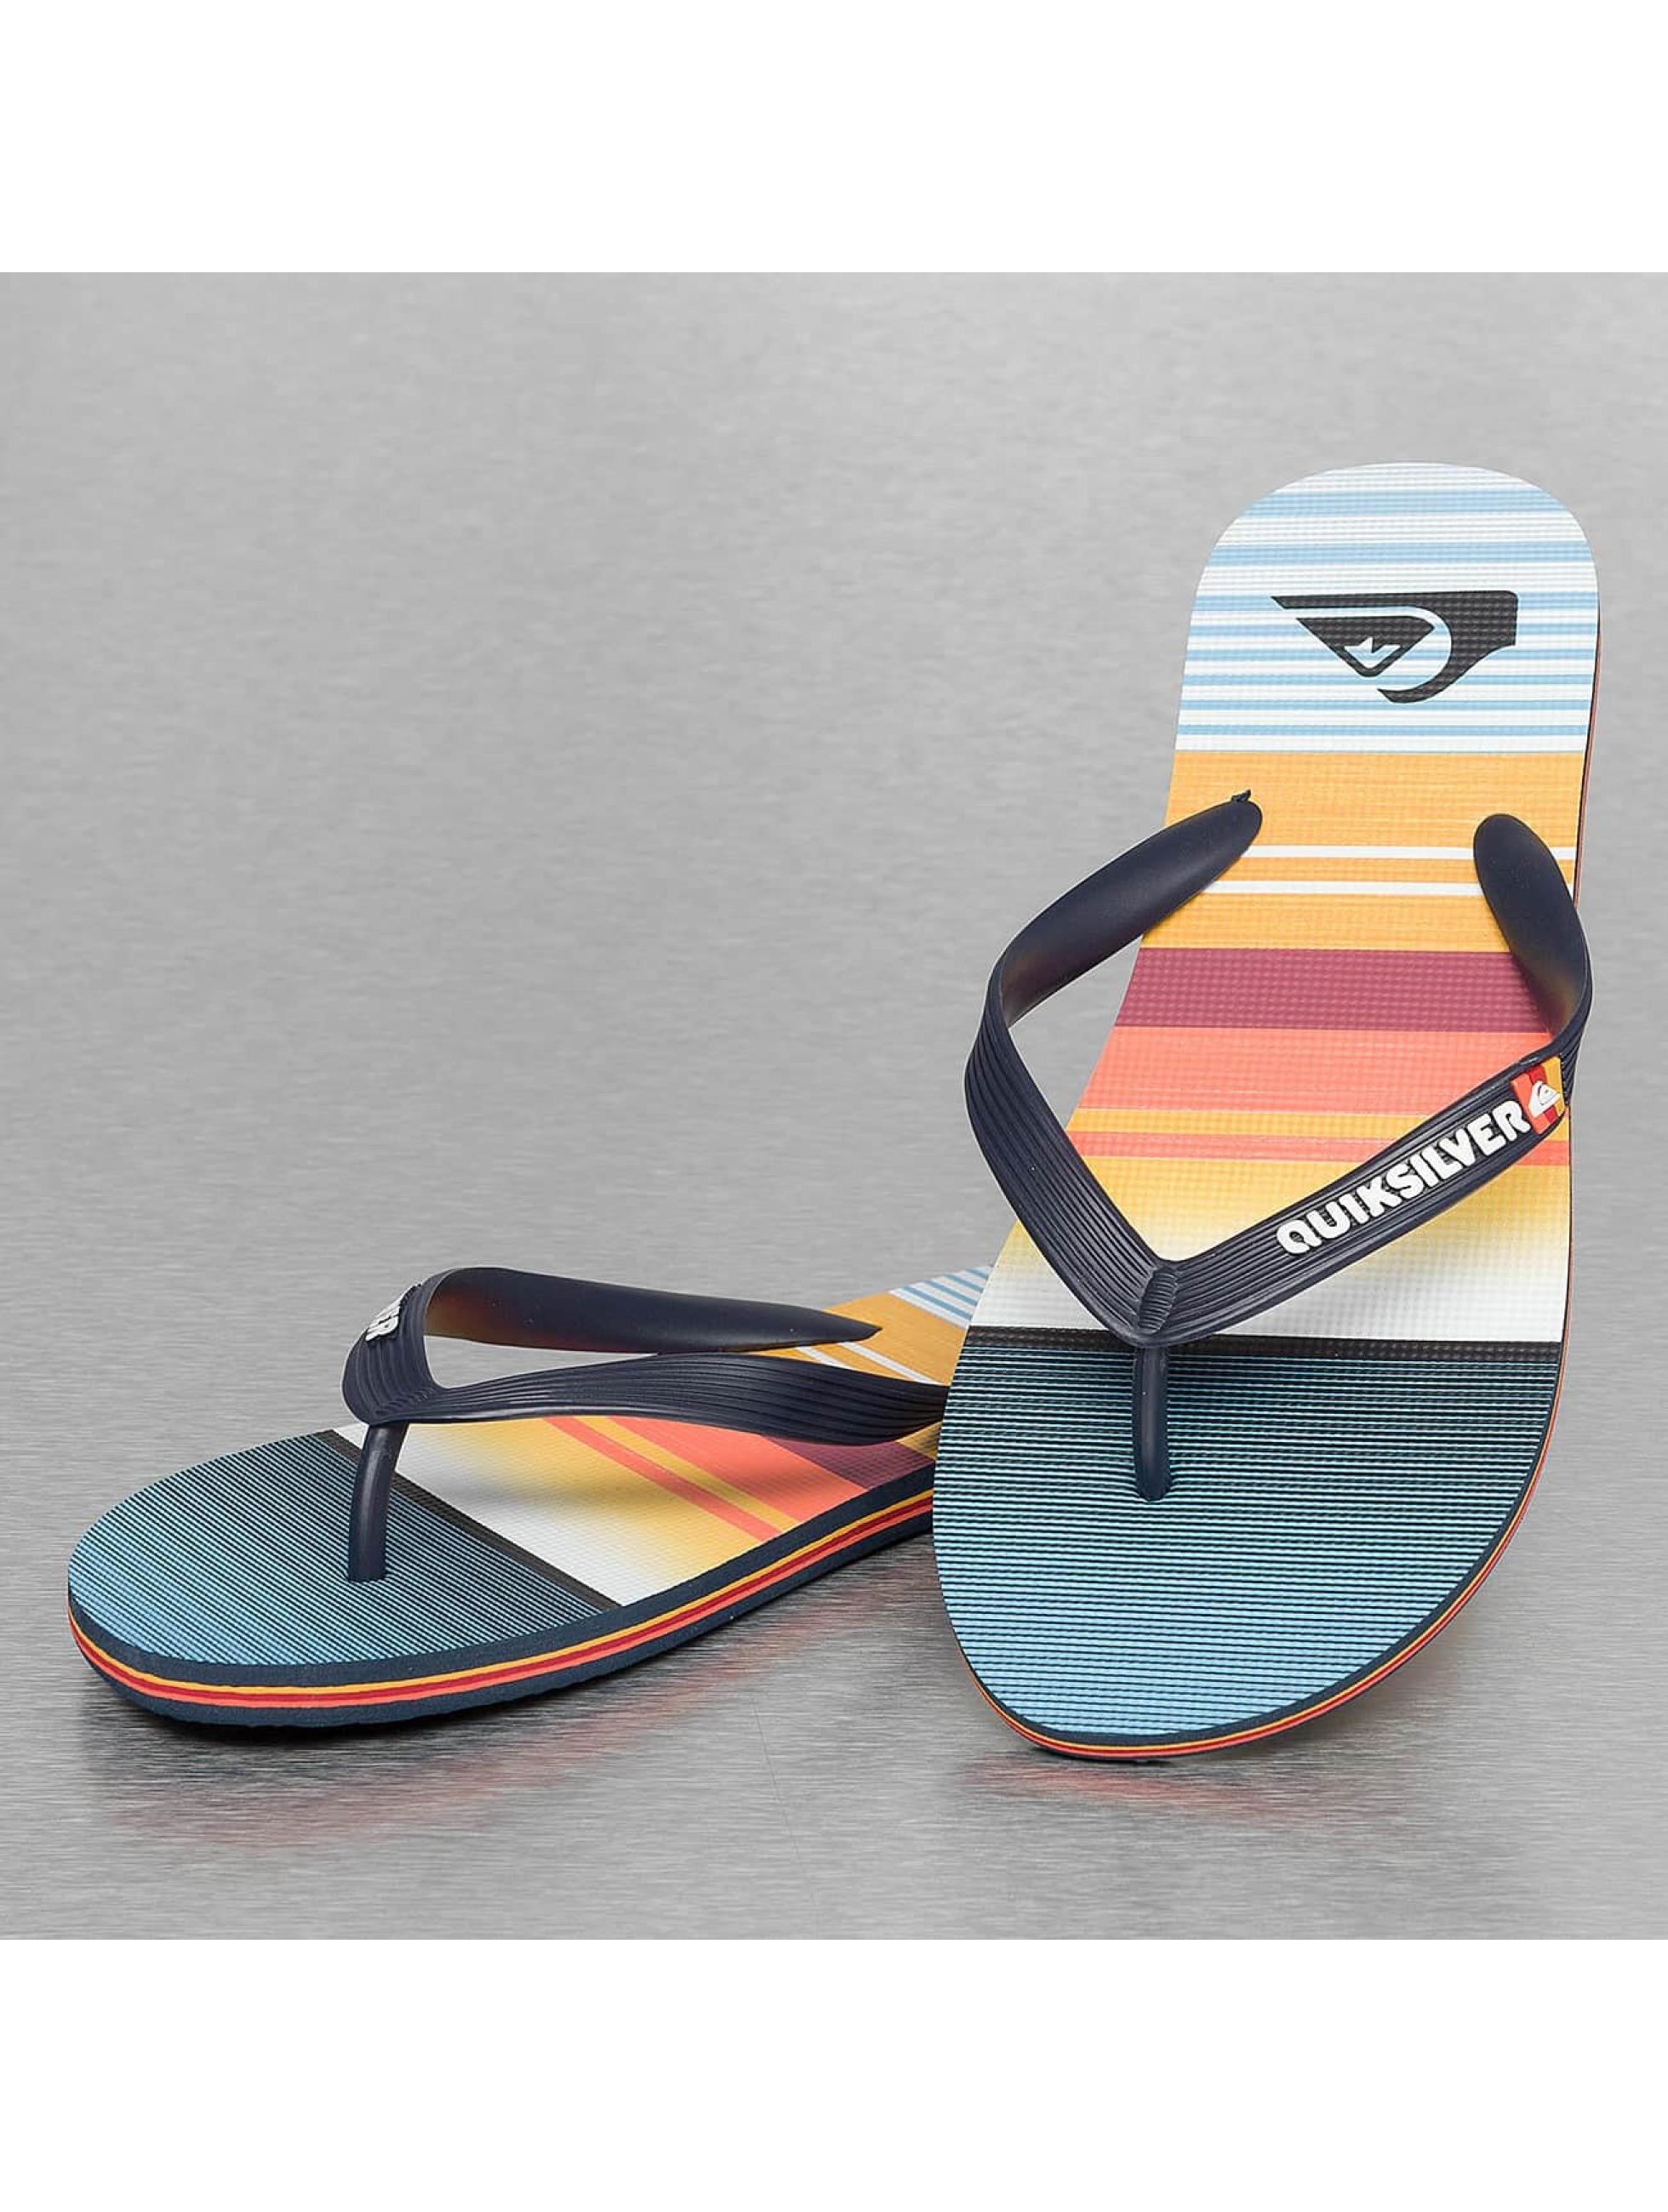 Quiksilver Sandals Molokai Everyday Stripe blue